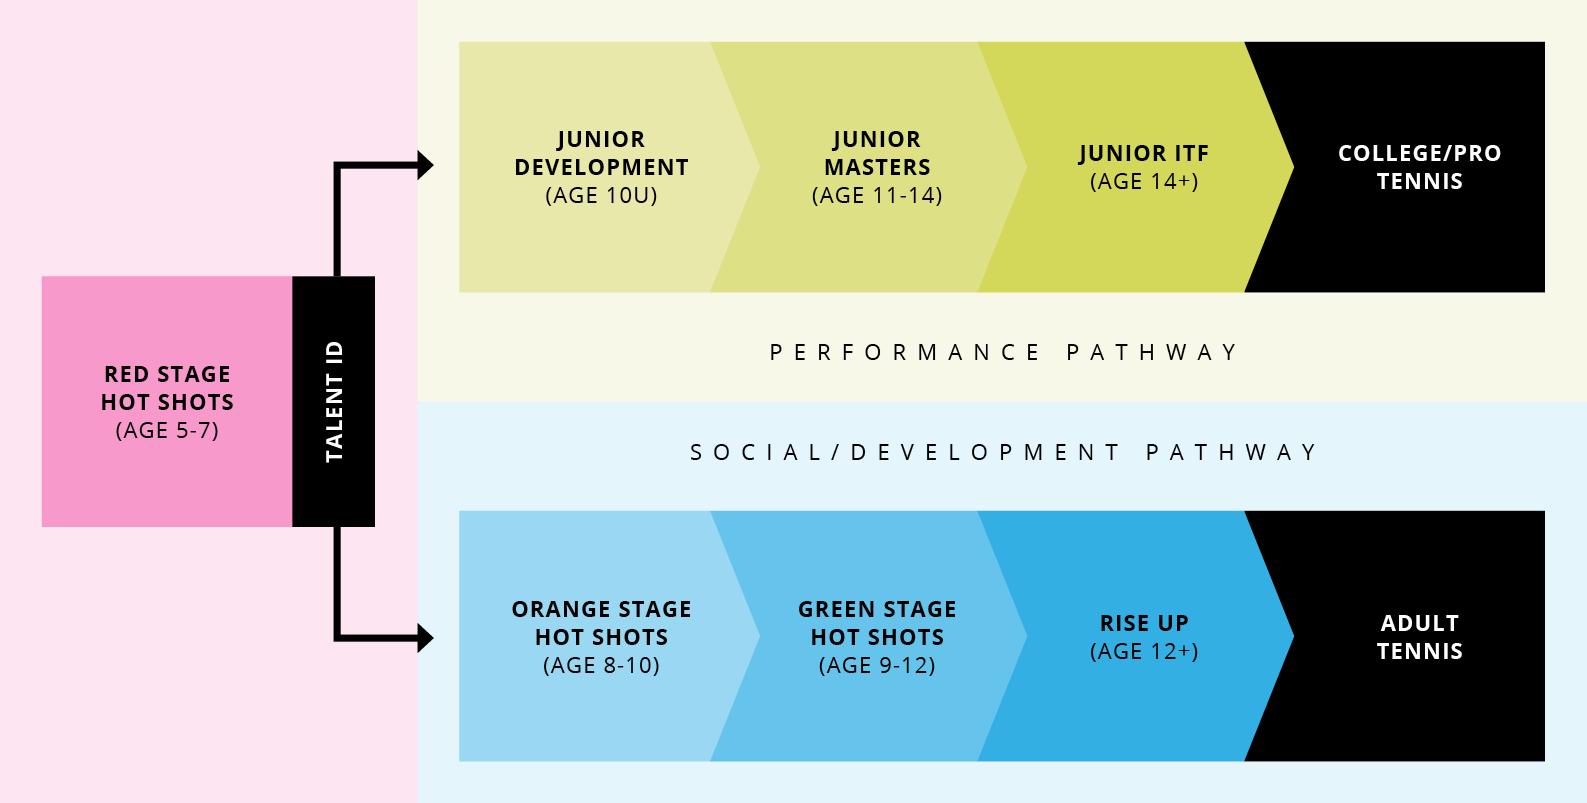 PLANiTPRO Performance and Development/Social Player Pathways